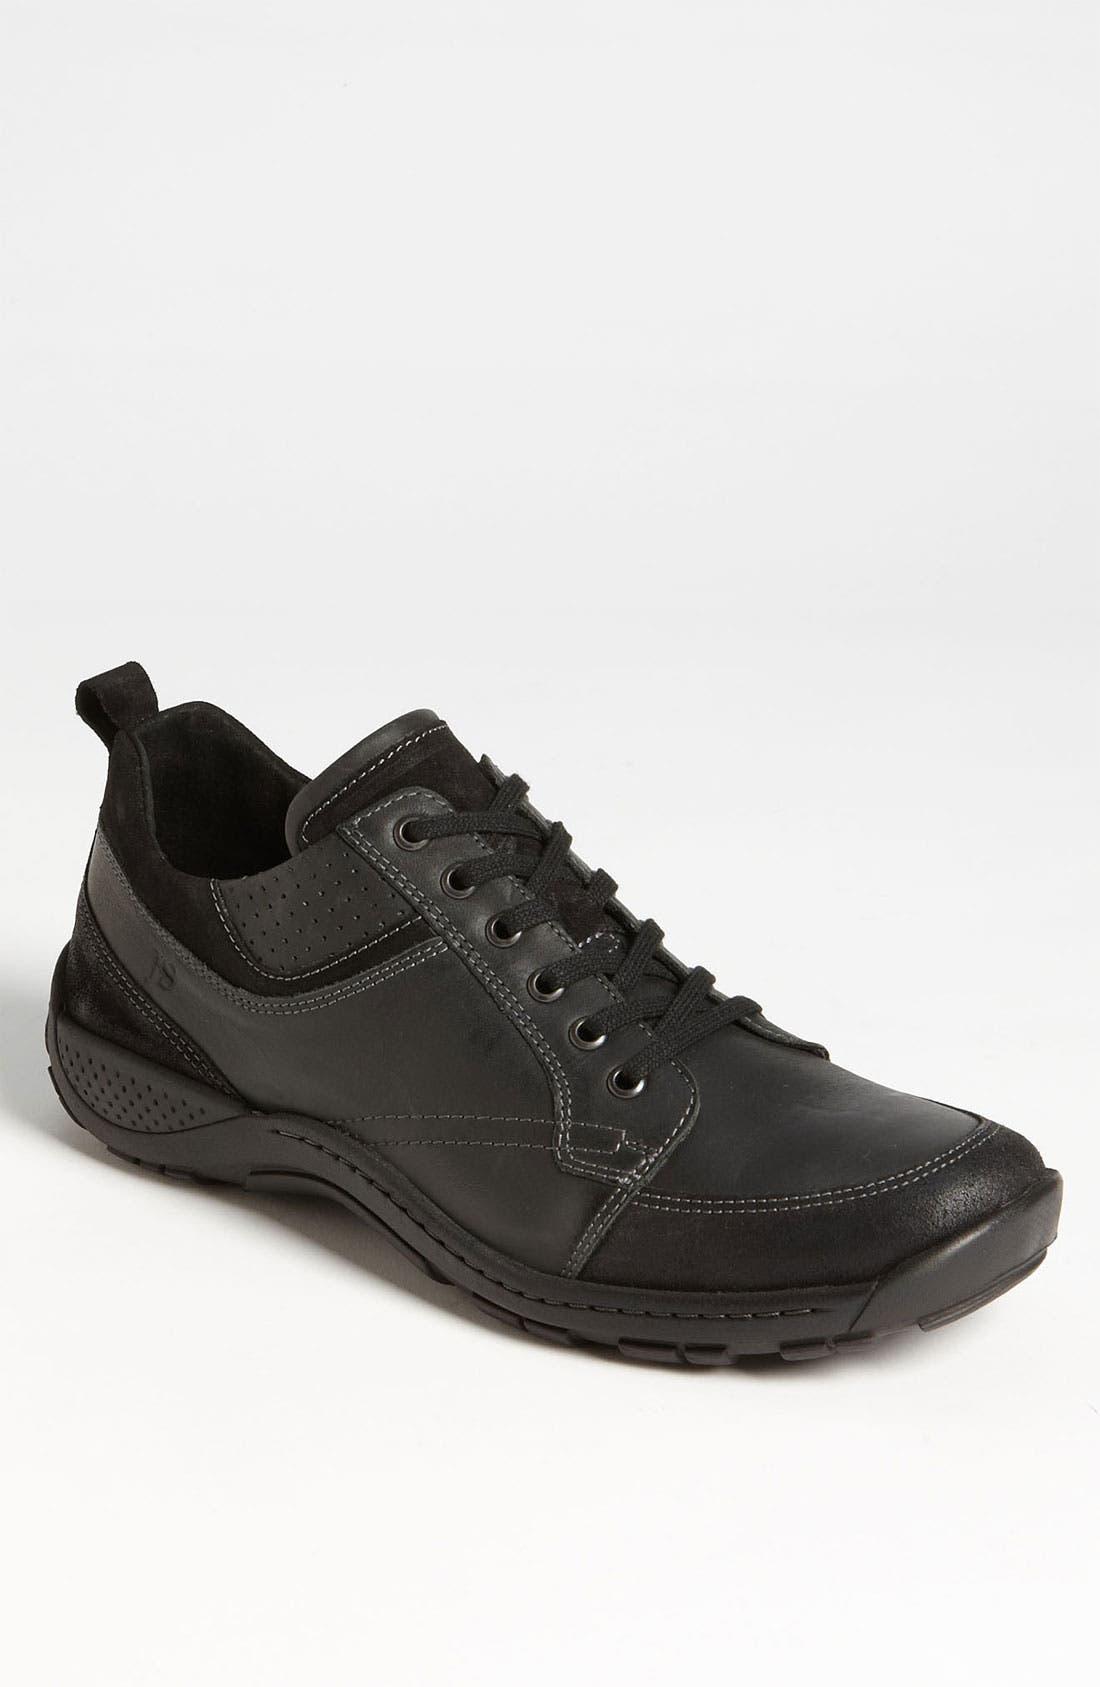 Alternate Image 1 Selected - Josef Seibel 'Nolan' Sneaker (Men)